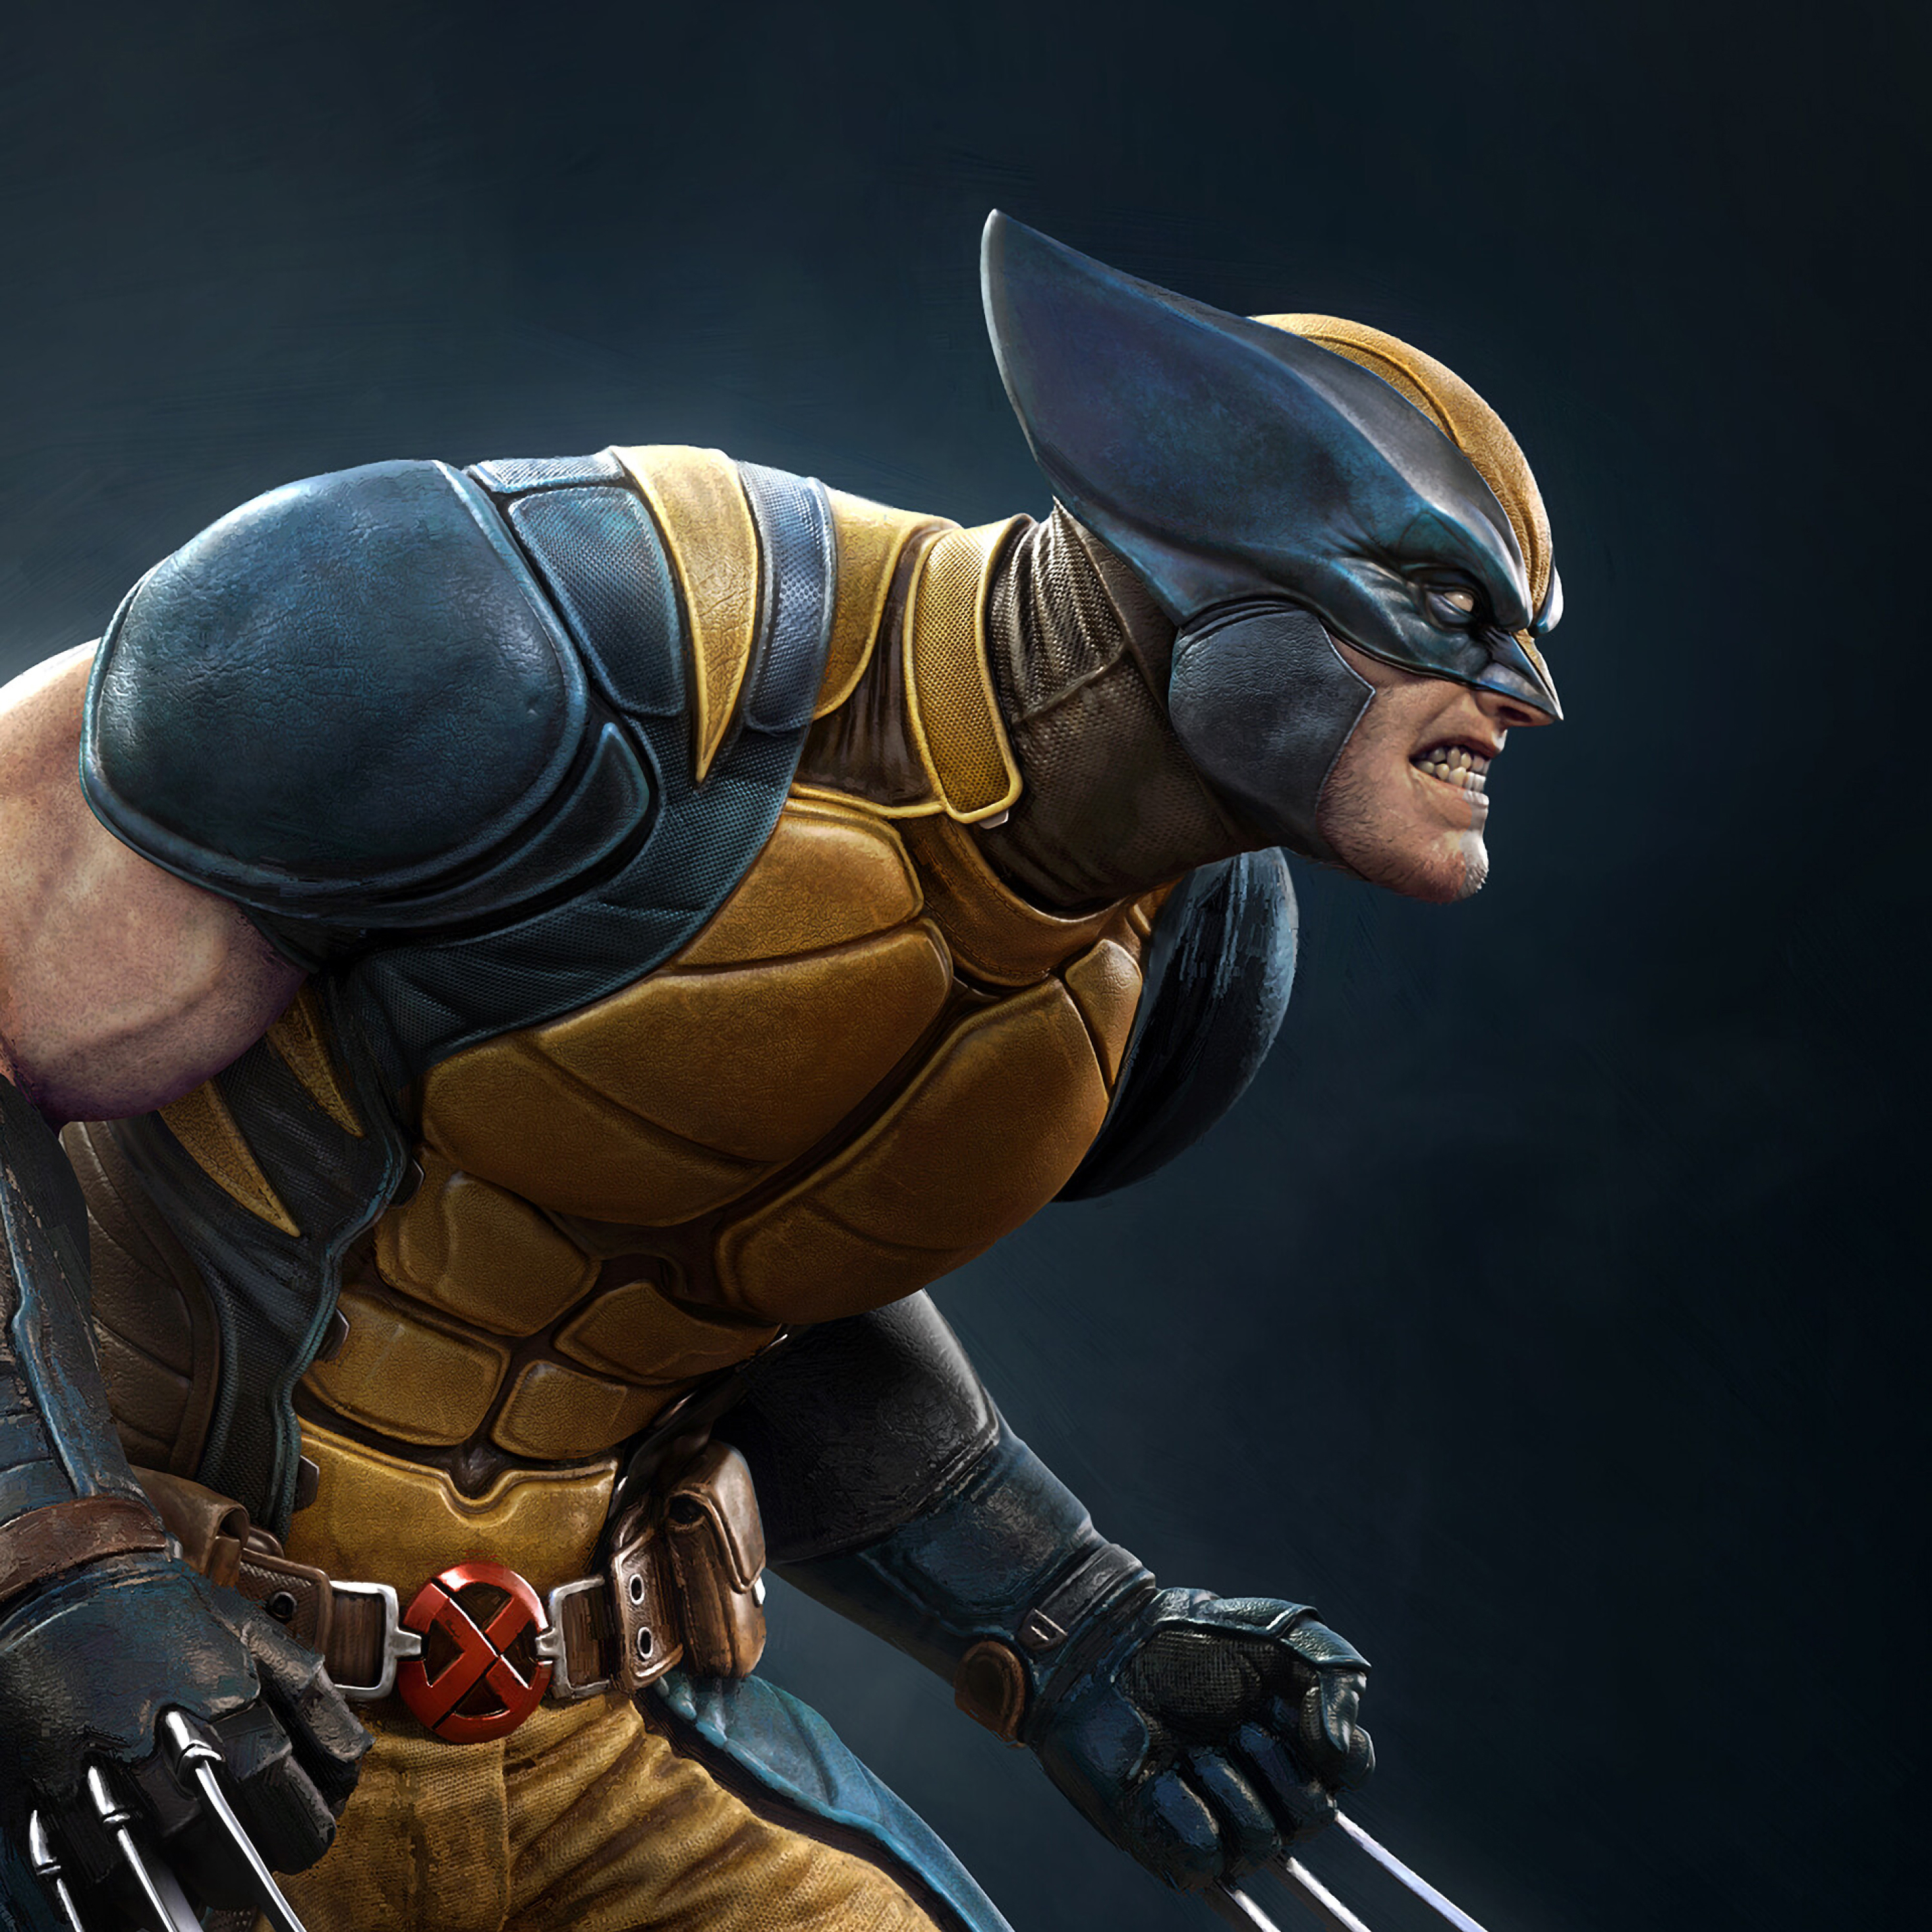 2932x2932 Wolverine X Men Art Ipad Pro Retina Display Wallpaper Hd Superheroes 4k Wallpapers Images Photos And Background